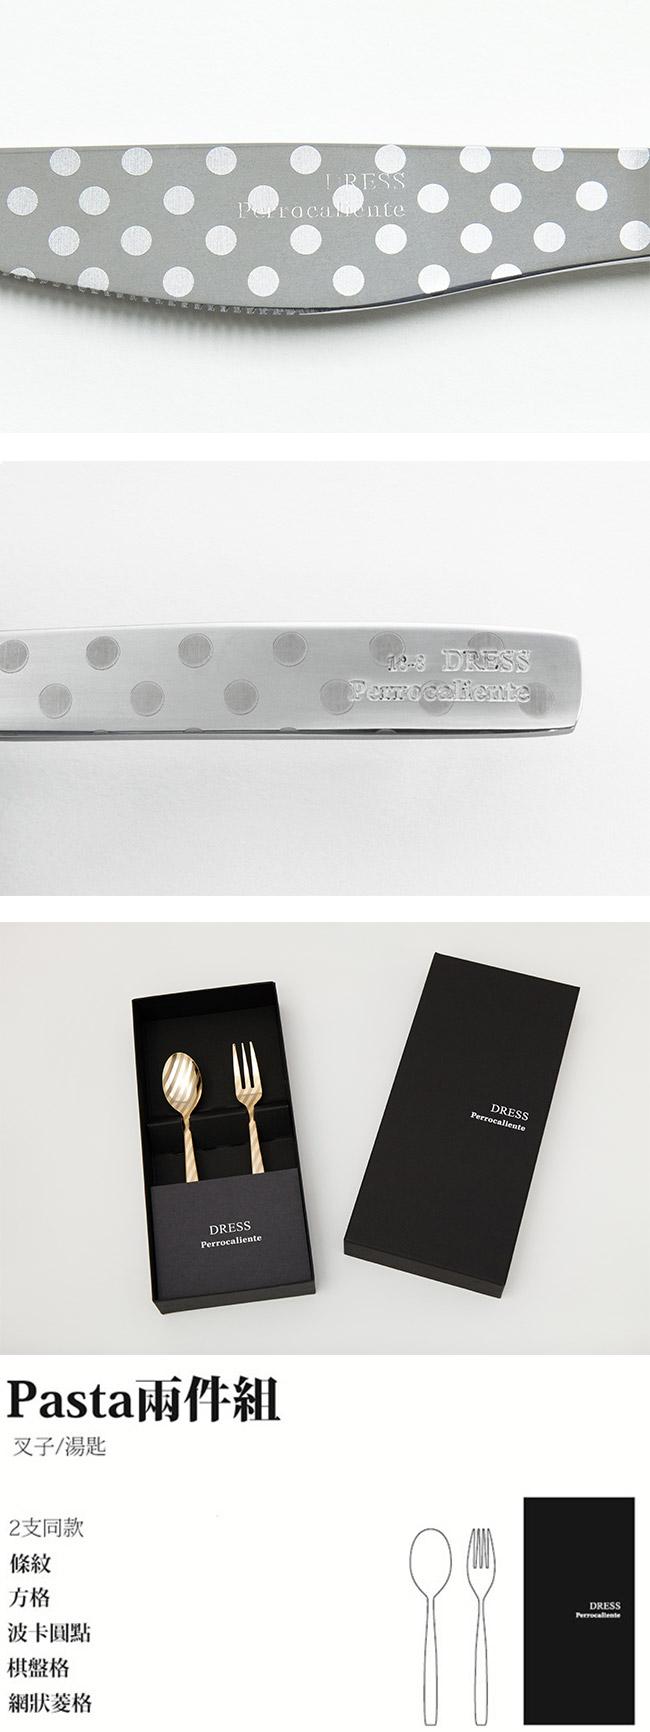 Perrocaliente Dress Gift Set 金色盒裝餐具組 點心匙&叉兩件組 波卡圓點